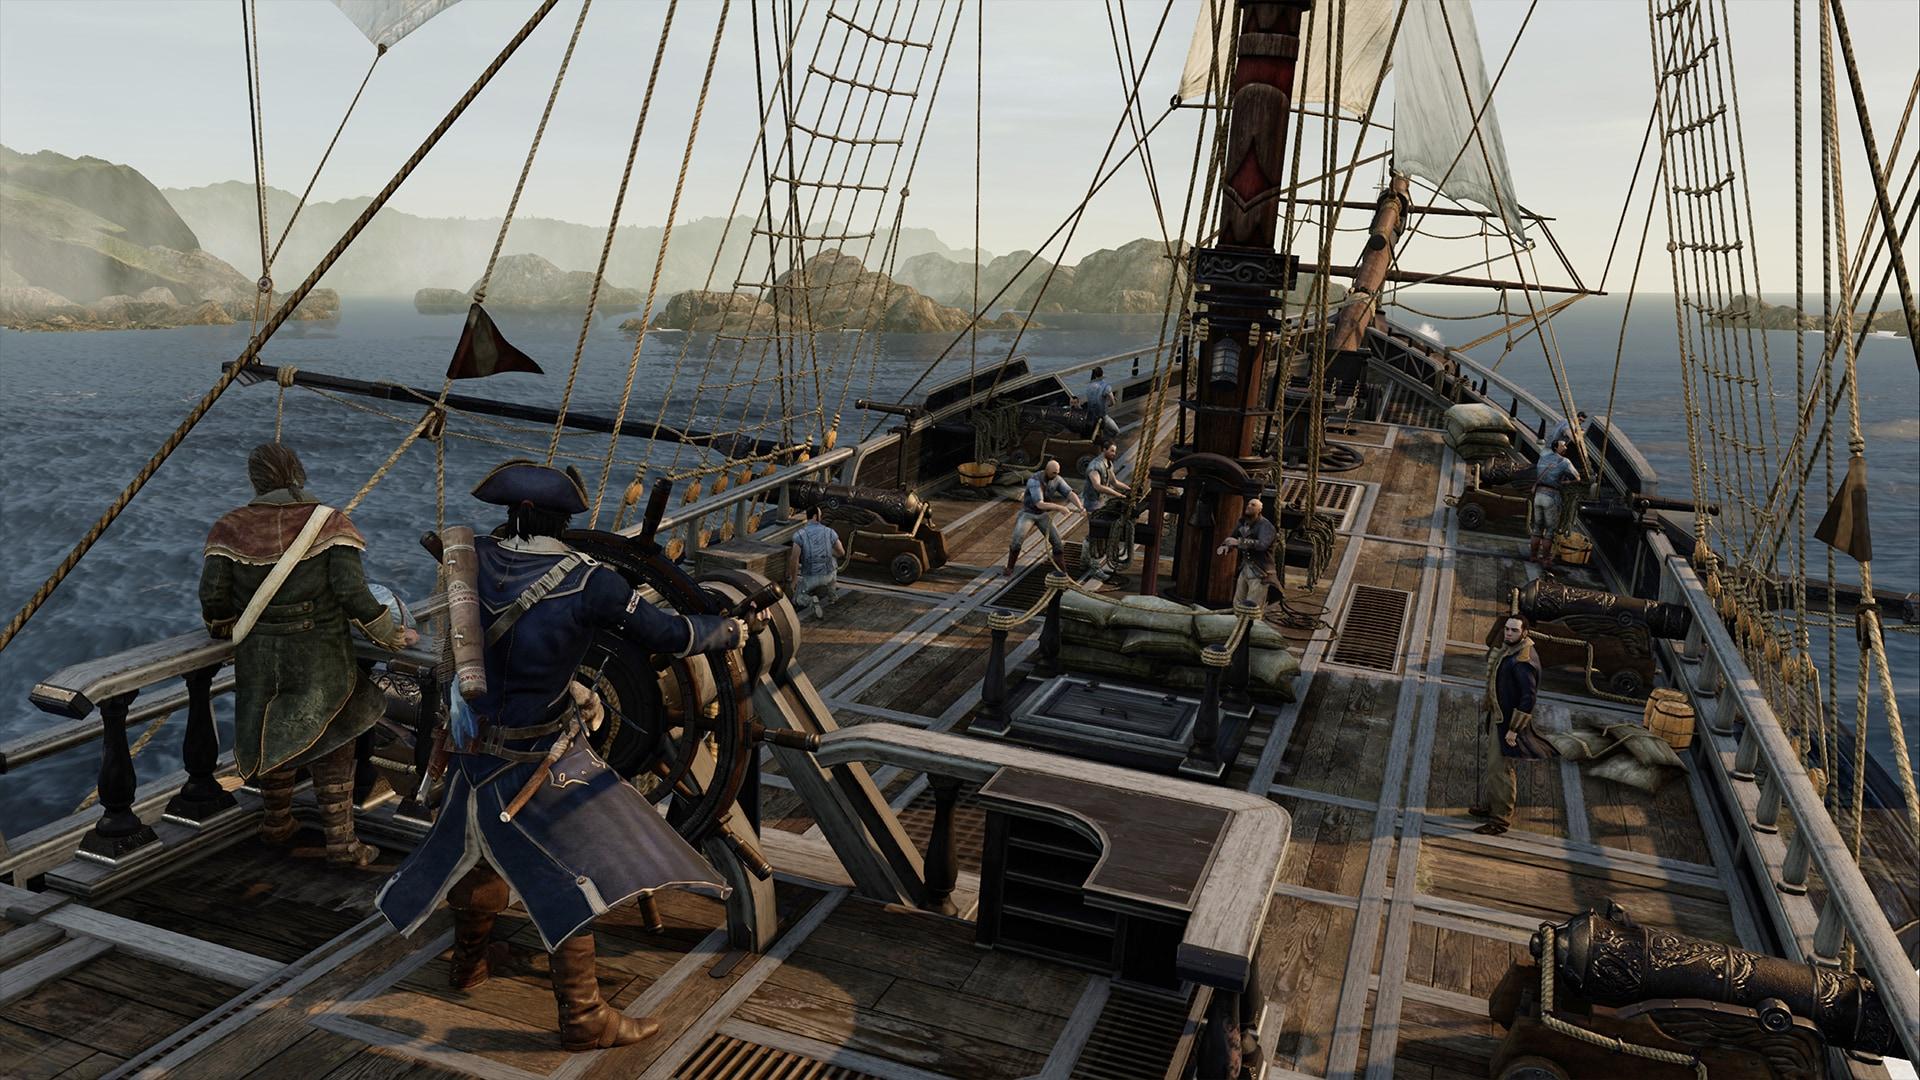 Assassin's Creed III: Remastered (Nintendo Switch) - Nintendo Key - UNITED STATES - 4